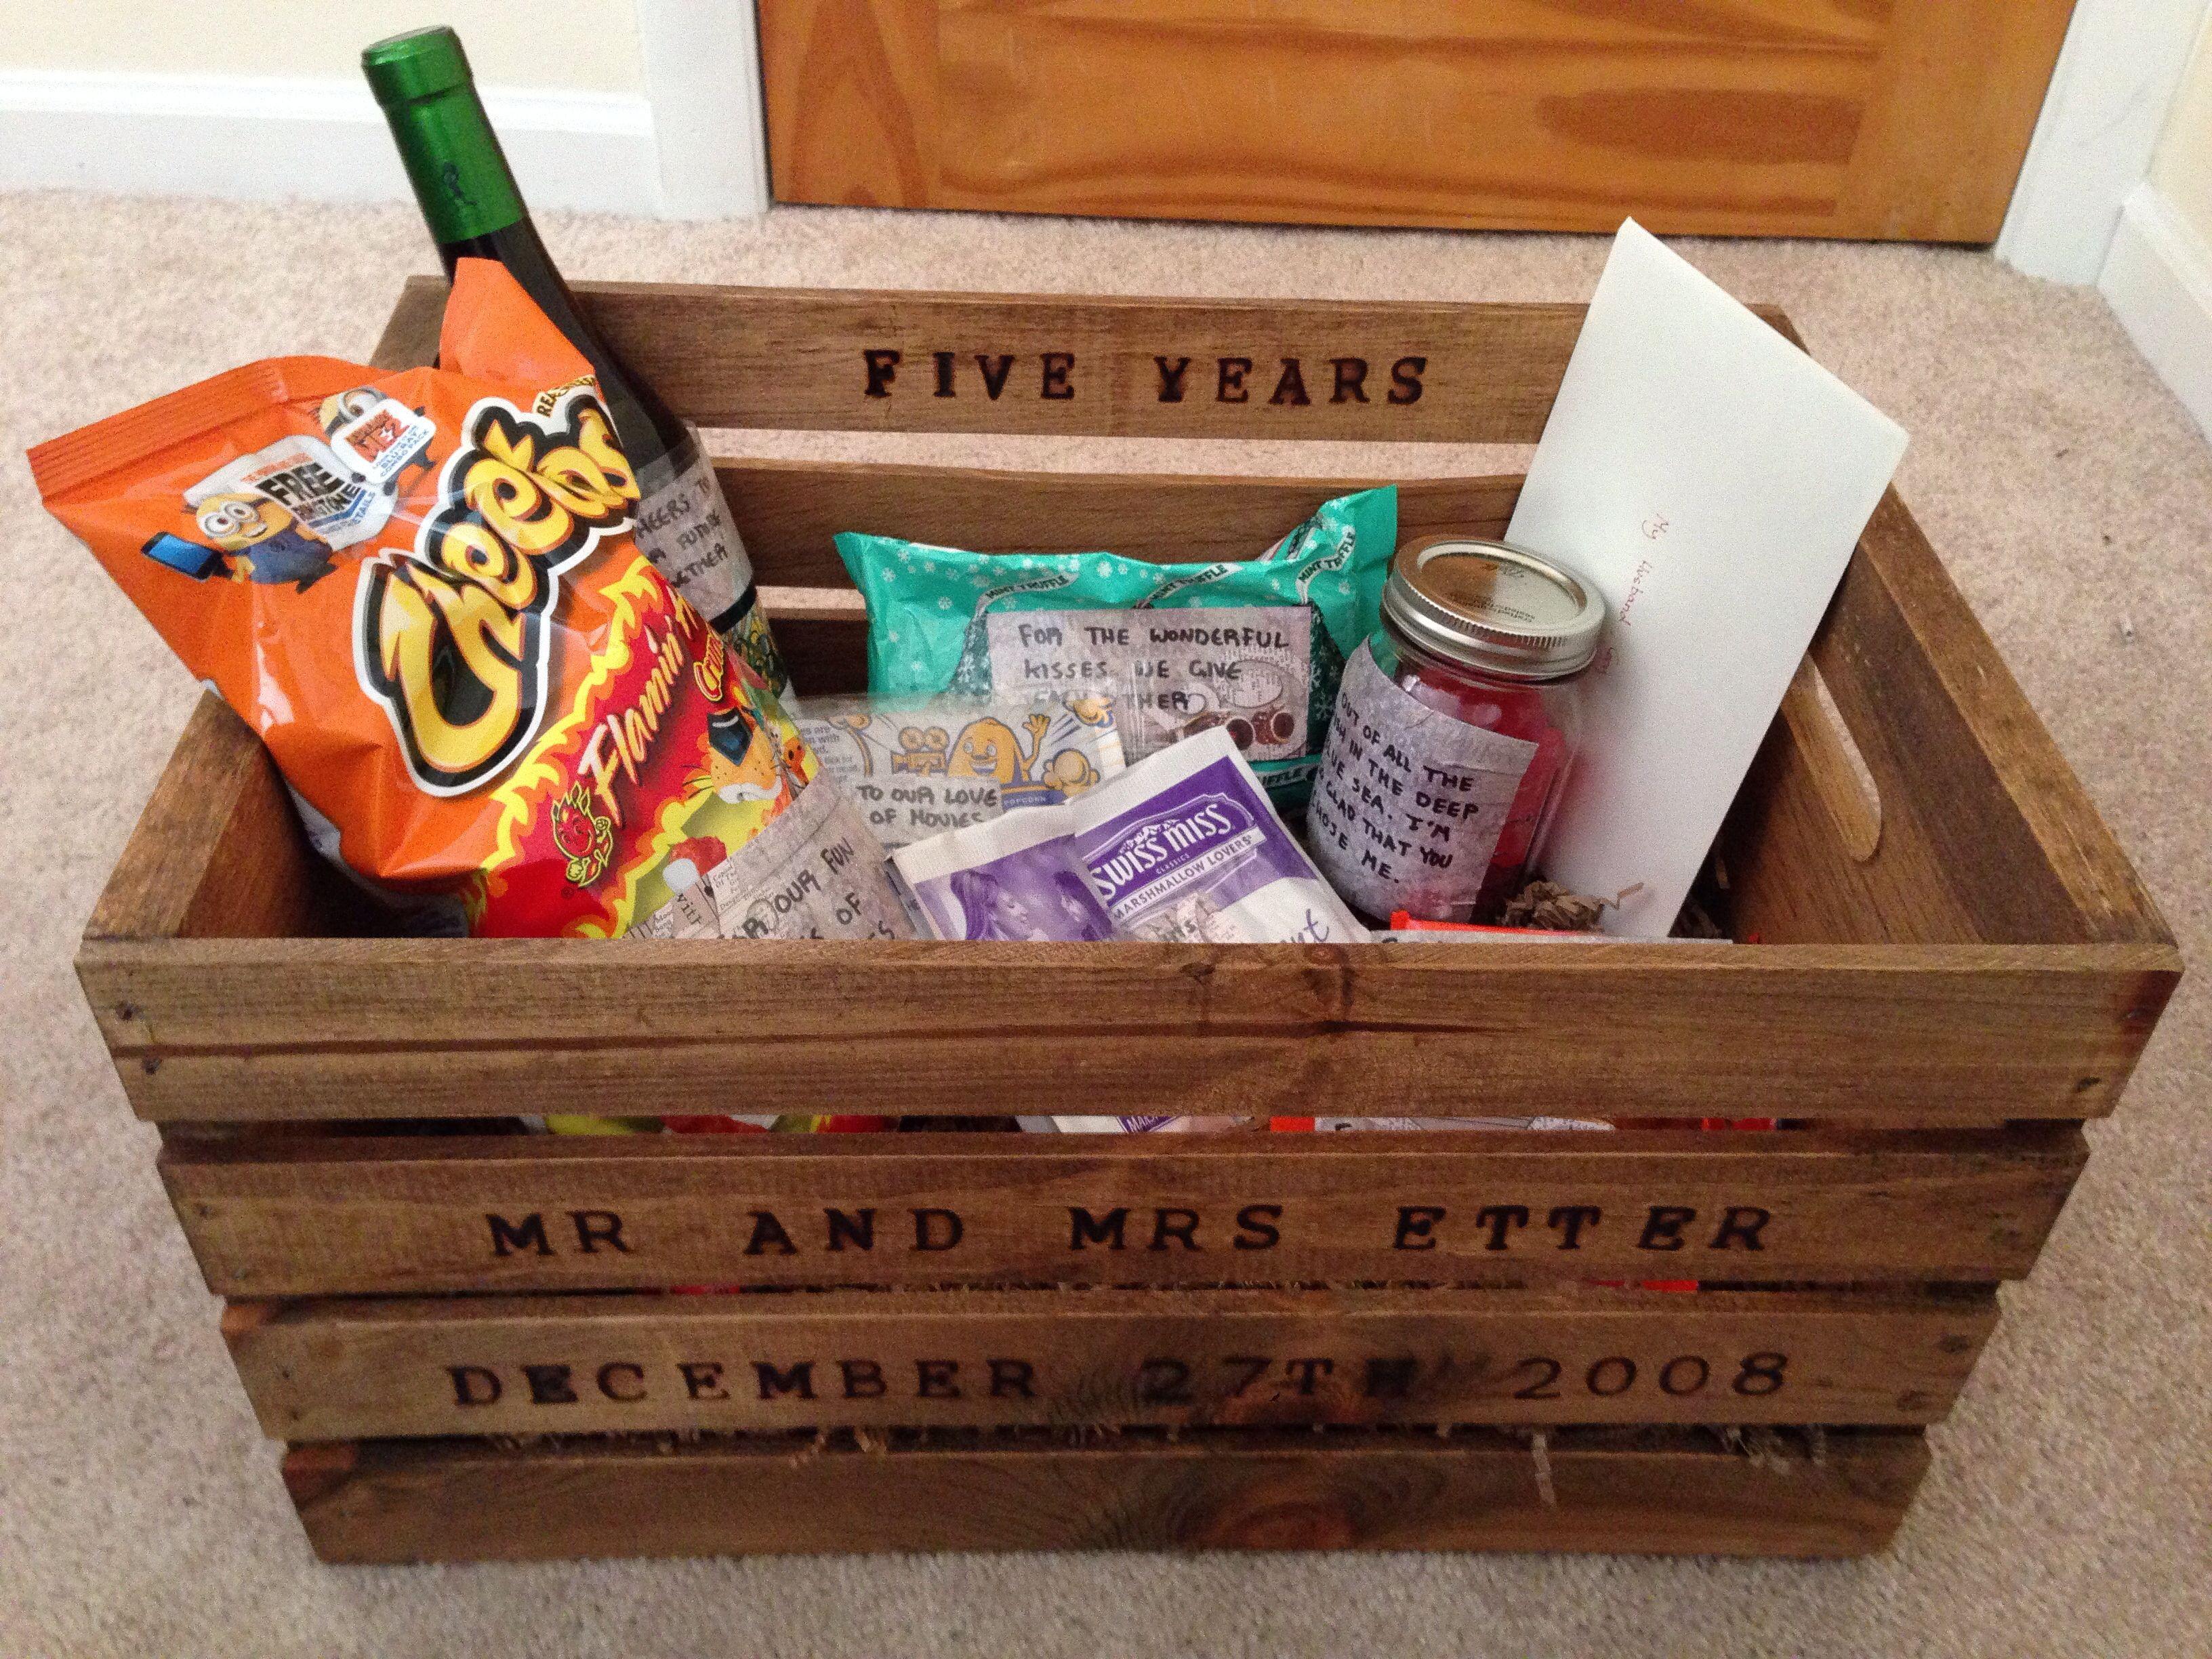 Best ideas about 4 Year Wedding Anniversary Gift Ideas For Him . Save or Pin Gift For 5 Year Anniversary creative Now.